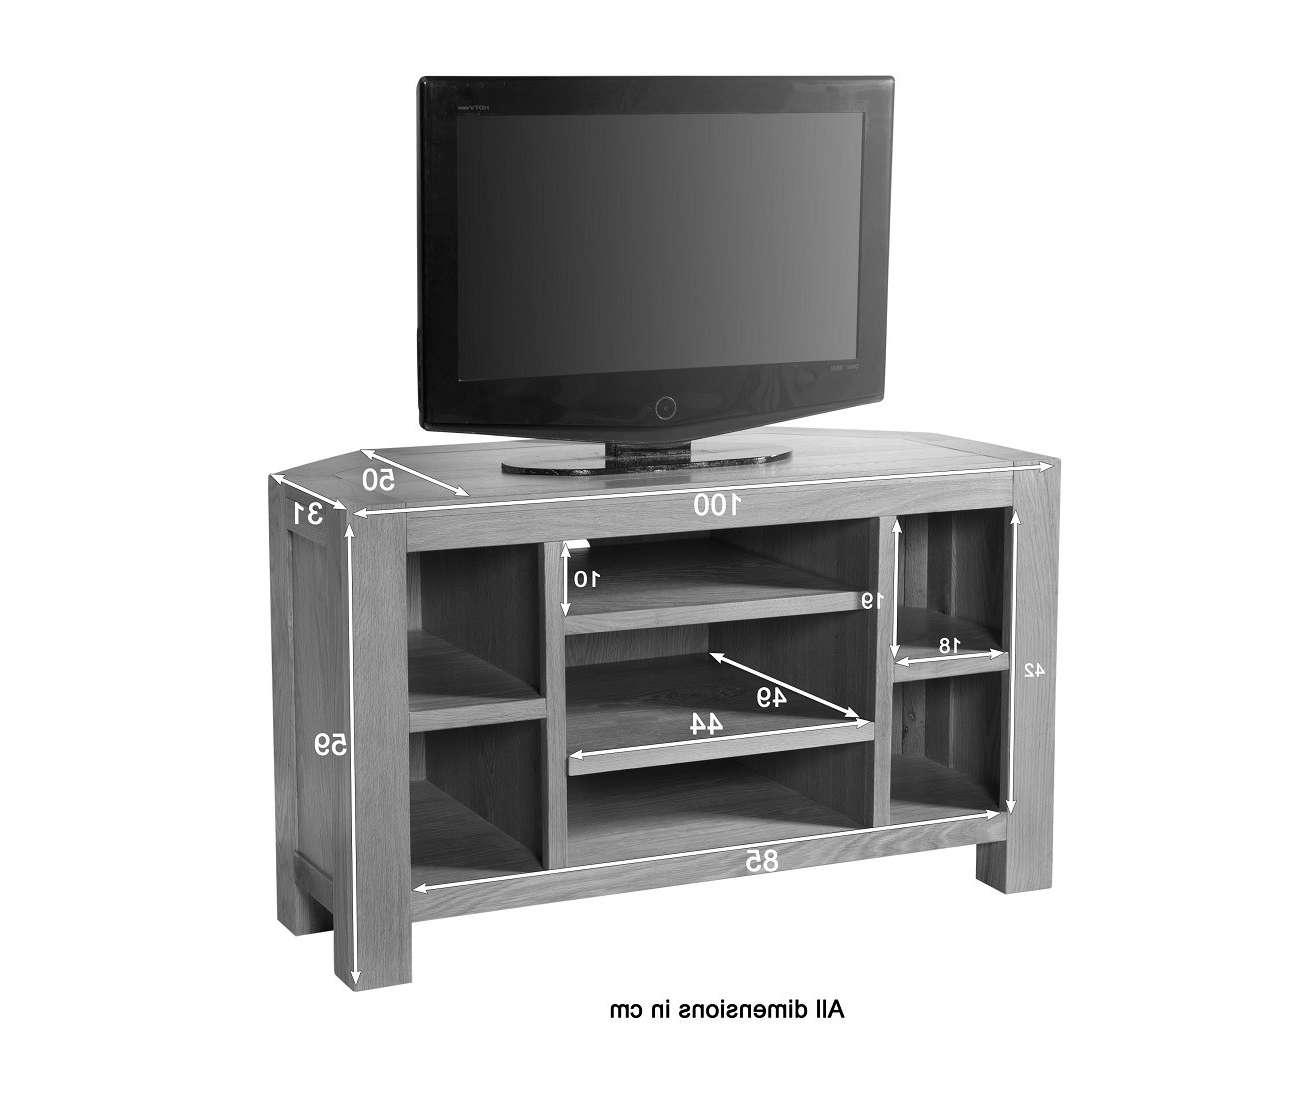 Aylesbury Contemporary Light Oak Corner Tv Unit | Oak Furniture Uk Regarding Light Oak Corner Tv Cabinets (View 3 of 20)